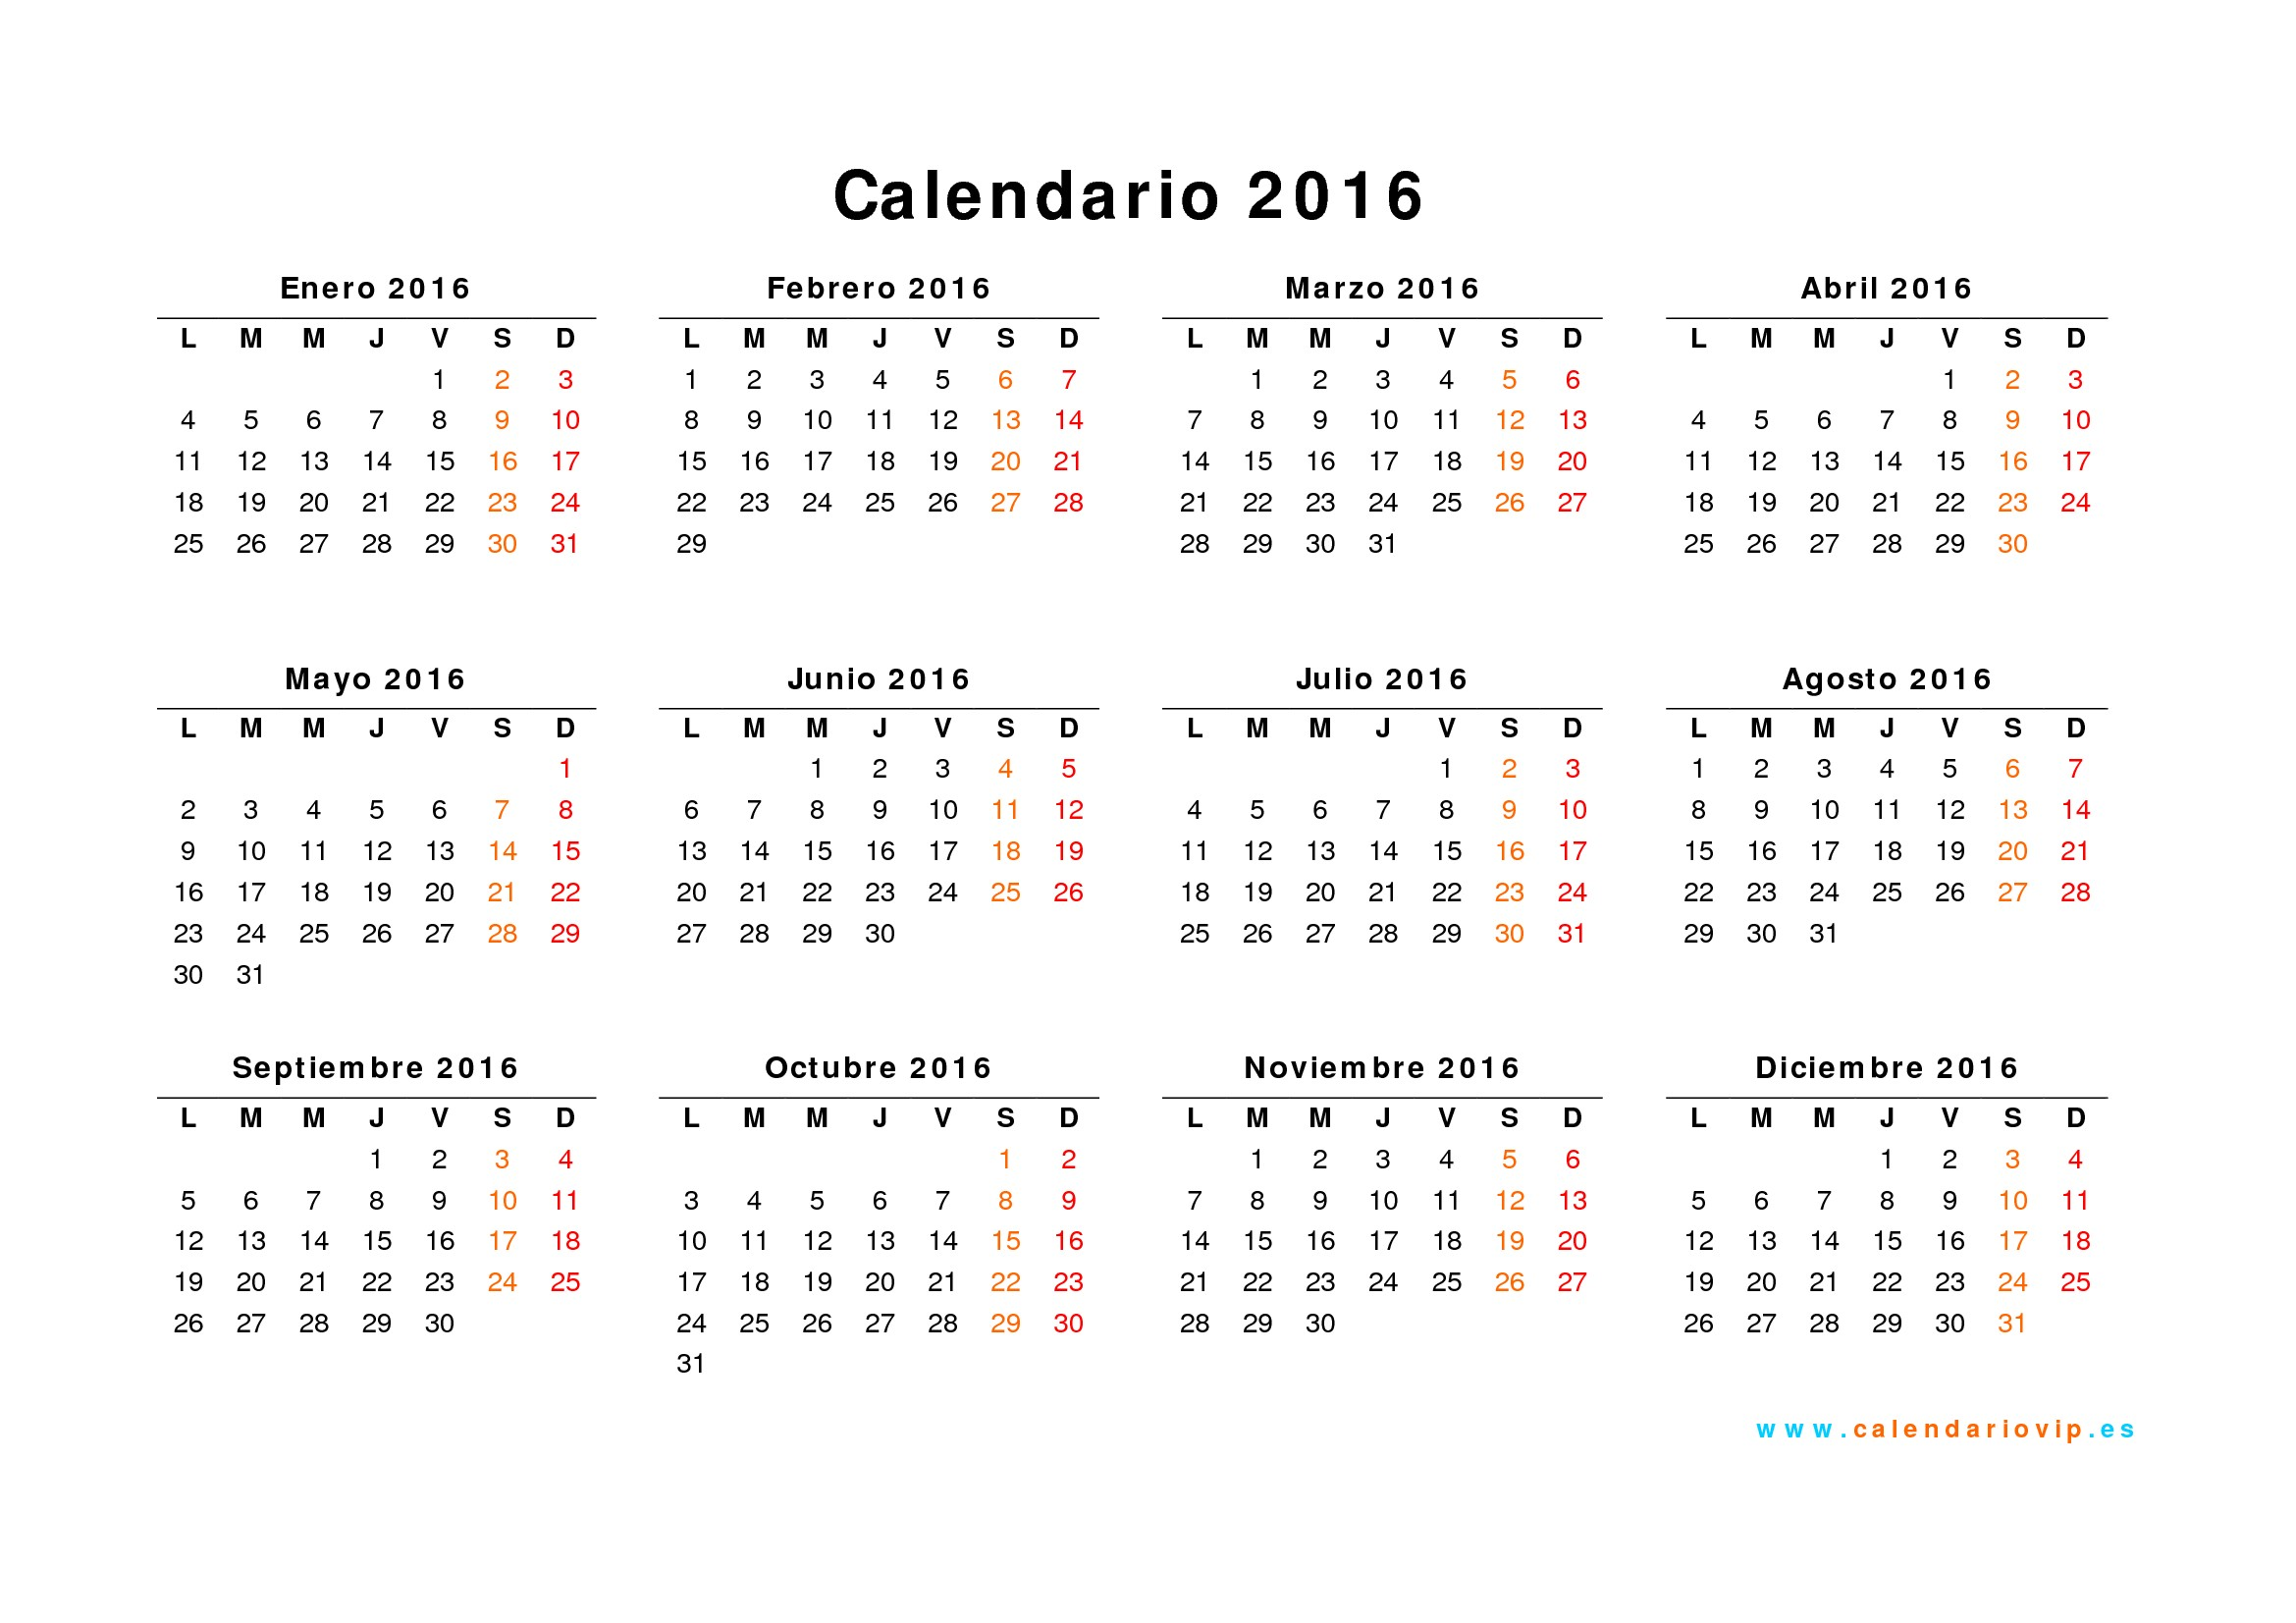 Calendarios anuales 2016 04